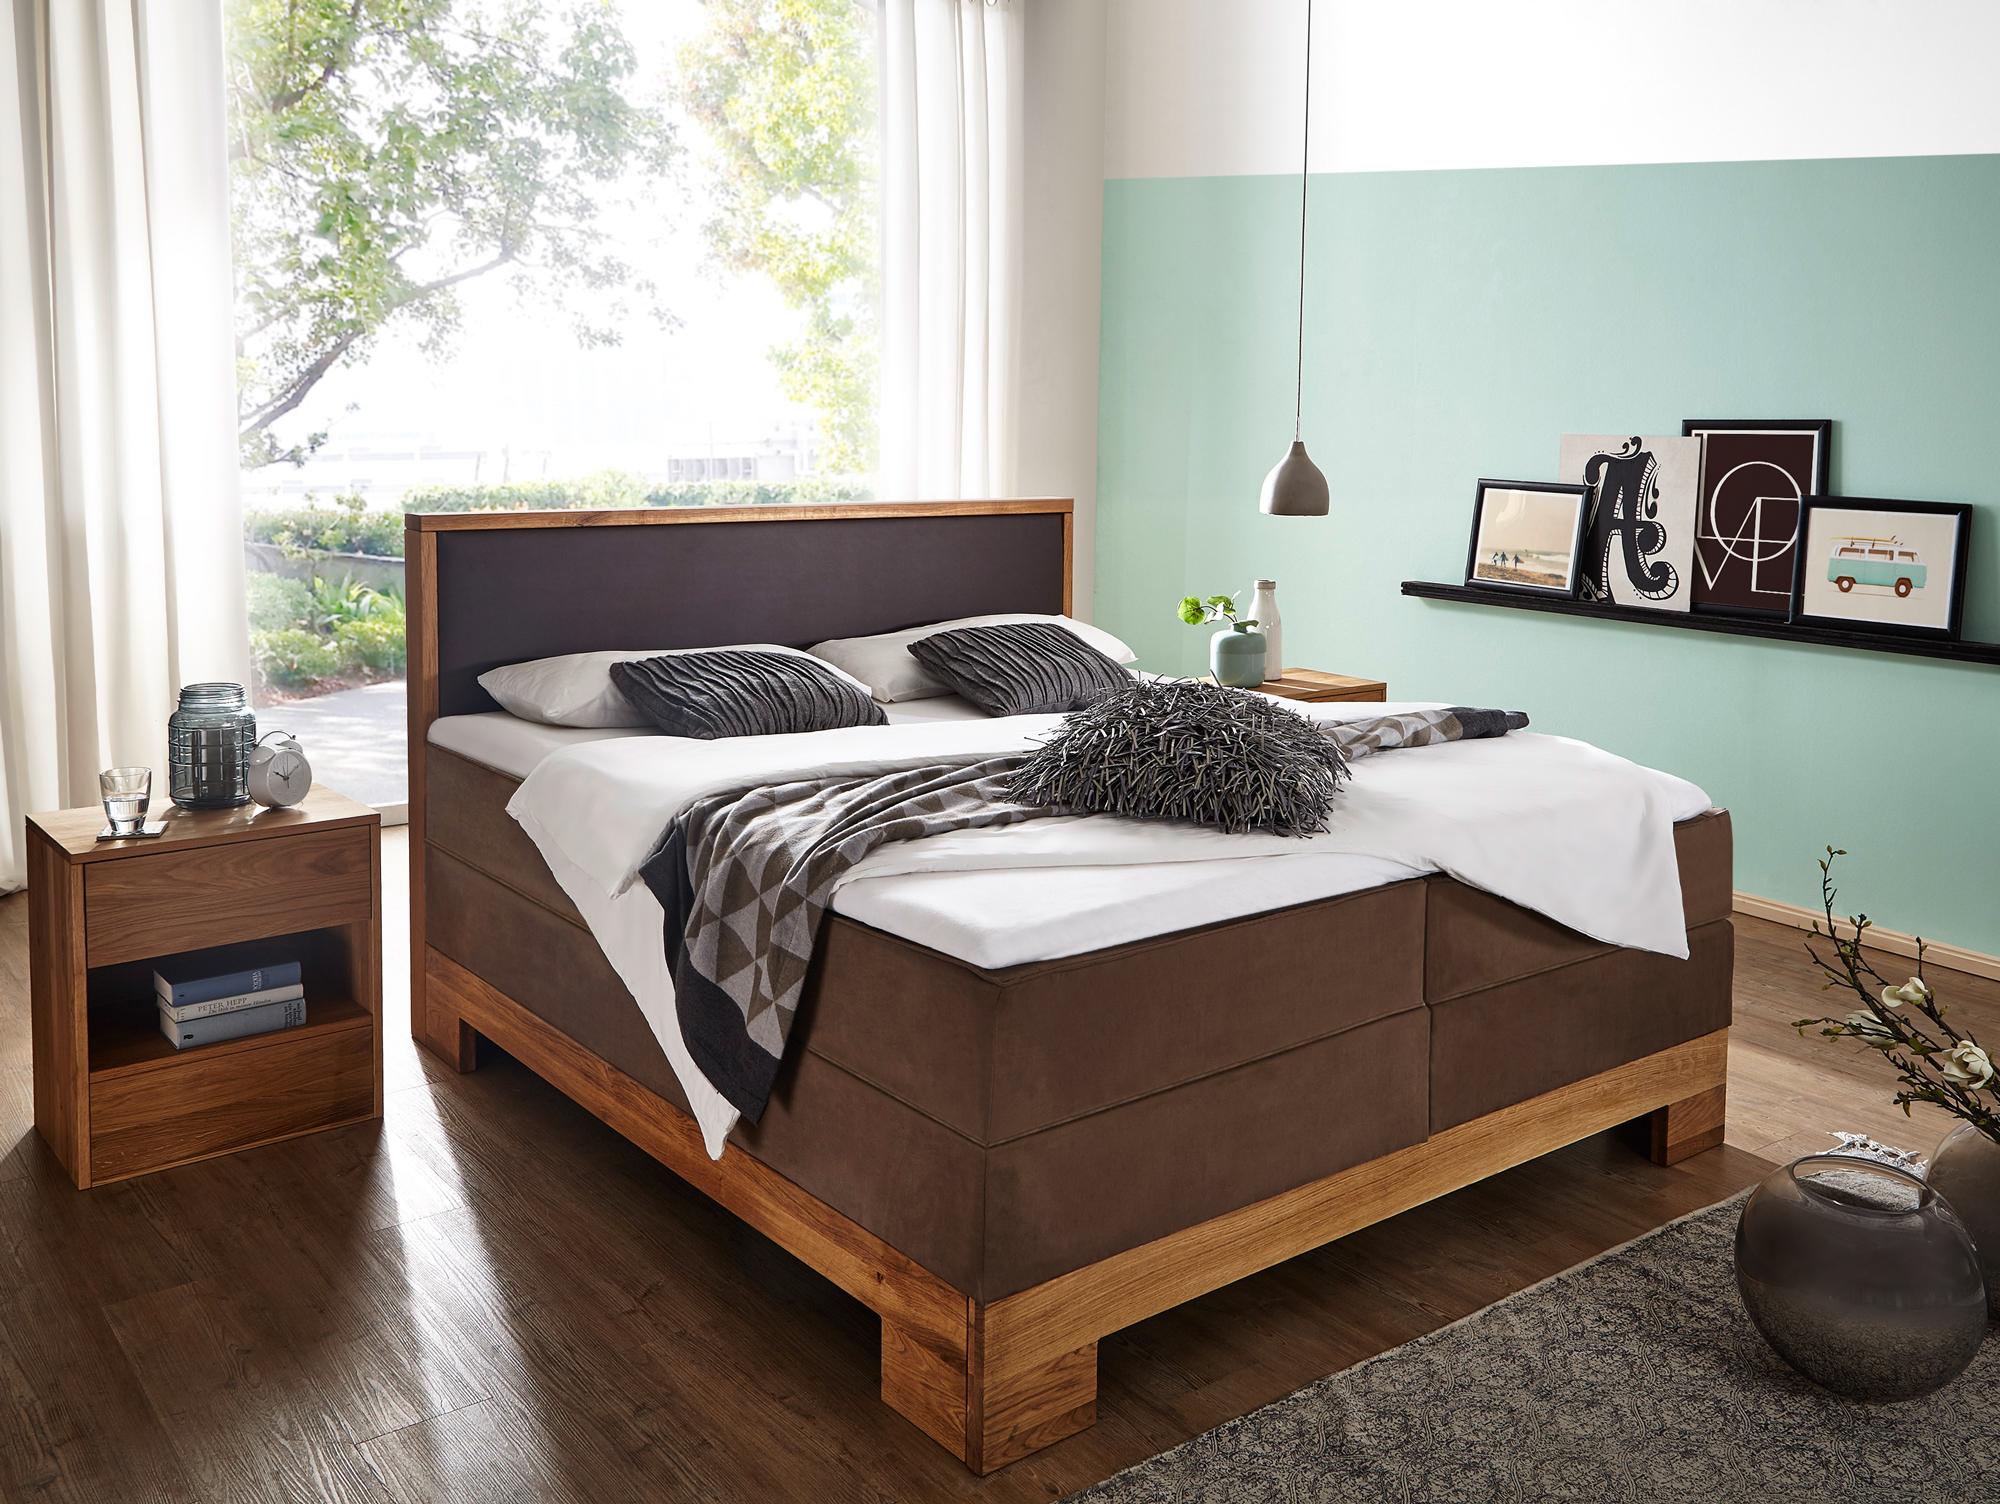 alina boxspringbett eiche braun 180 x 200 cm. Black Bedroom Furniture Sets. Home Design Ideas